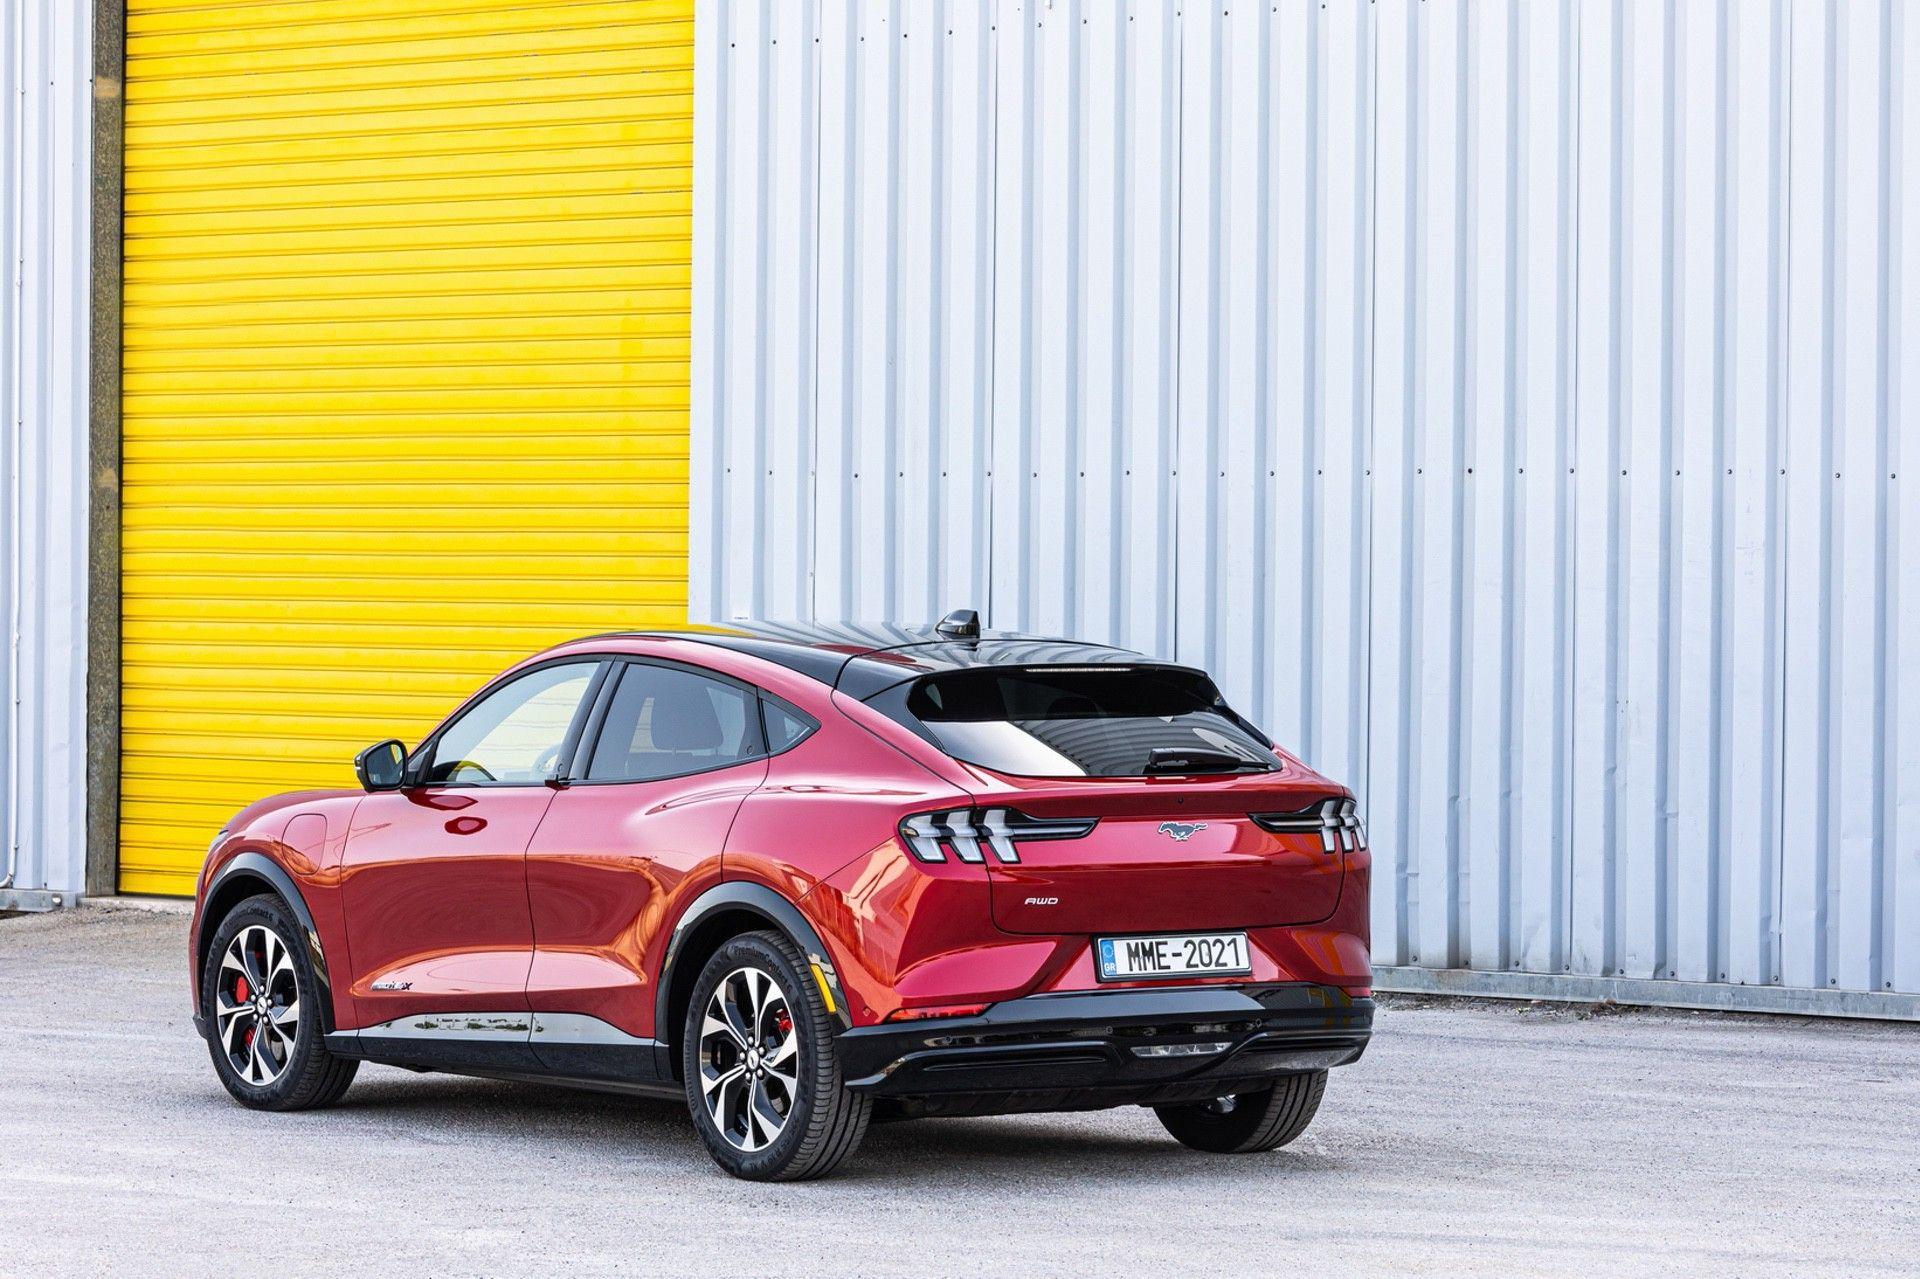 Ford_Mustang_Mach-E_greek_presskit-0046